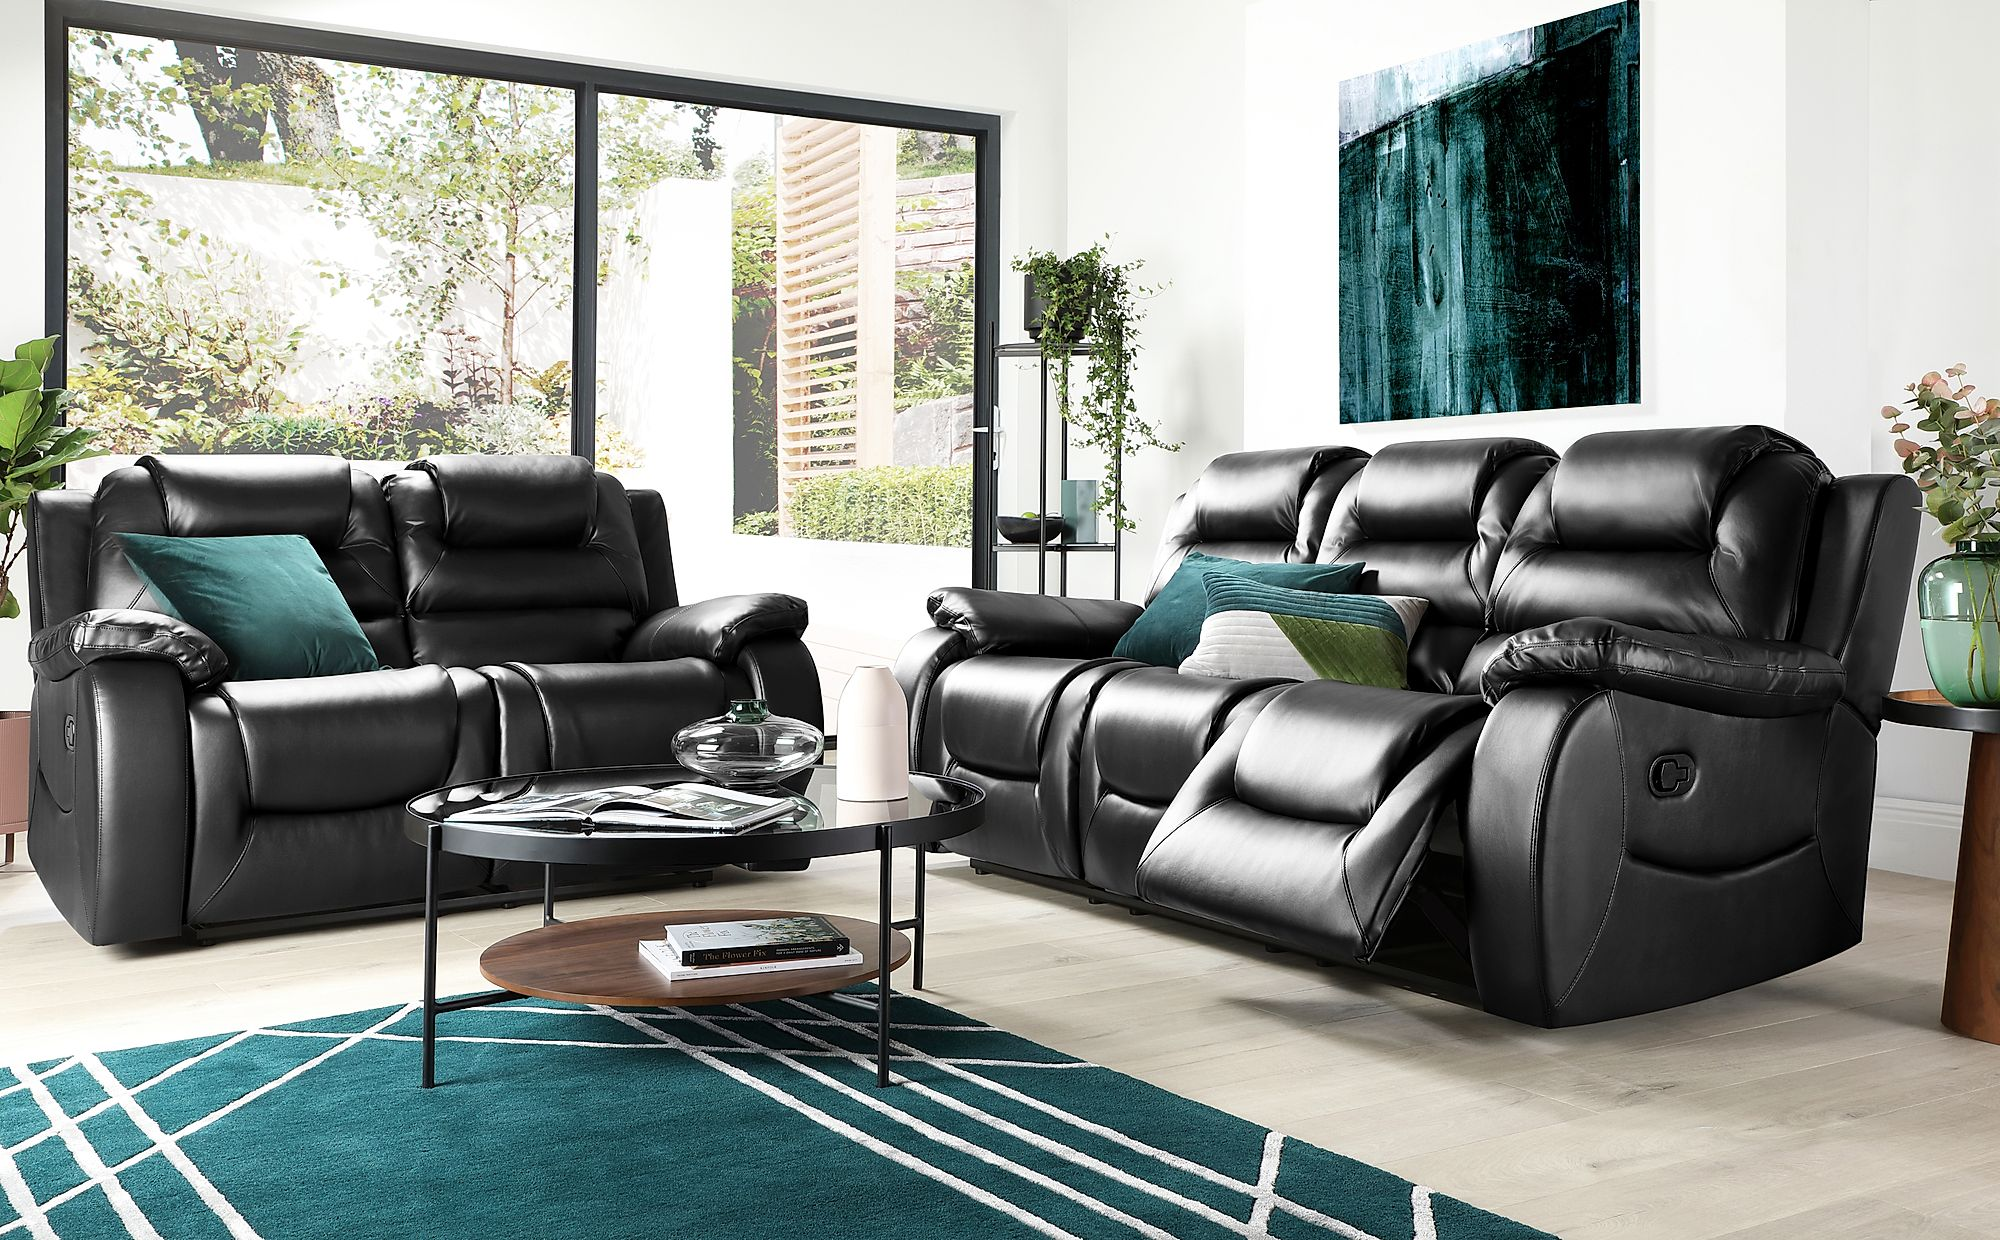 - Vancouver Black Leather 3+2 Seater Recliner Sofa Set Furniture